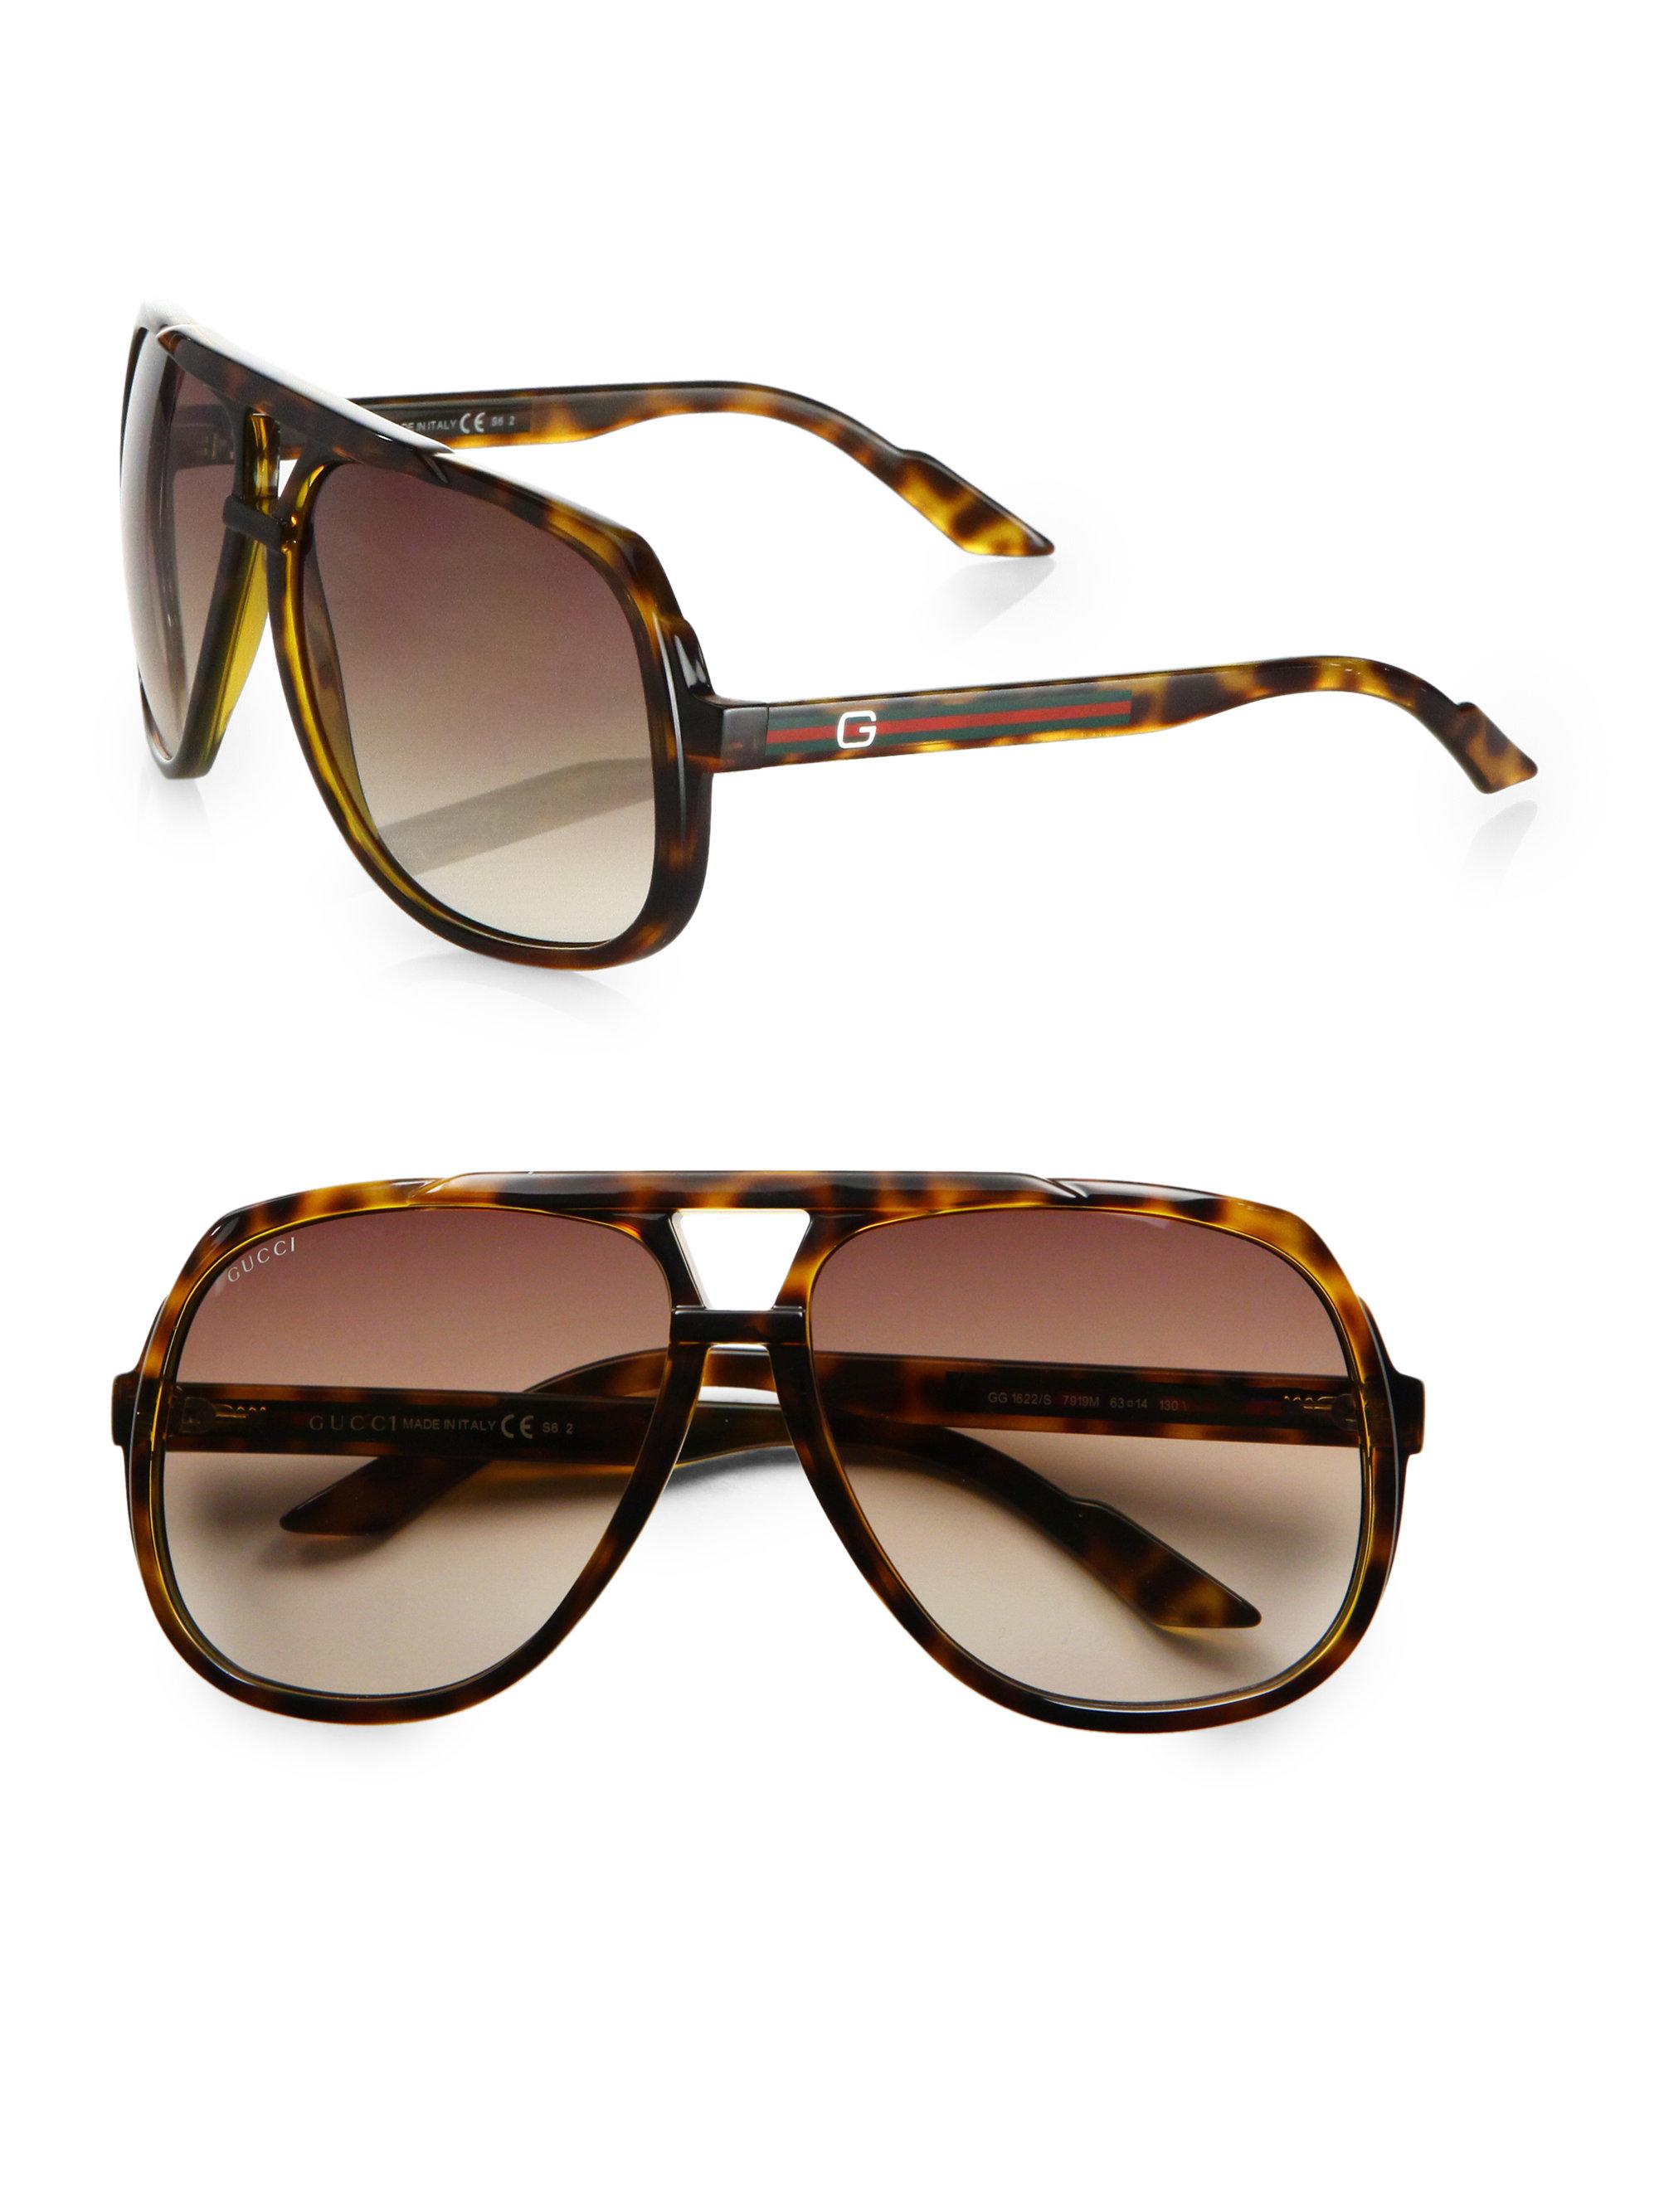 09c49c855fdf Gucci Plastic Aviator Sunglasses in Brown for Men - Lyst